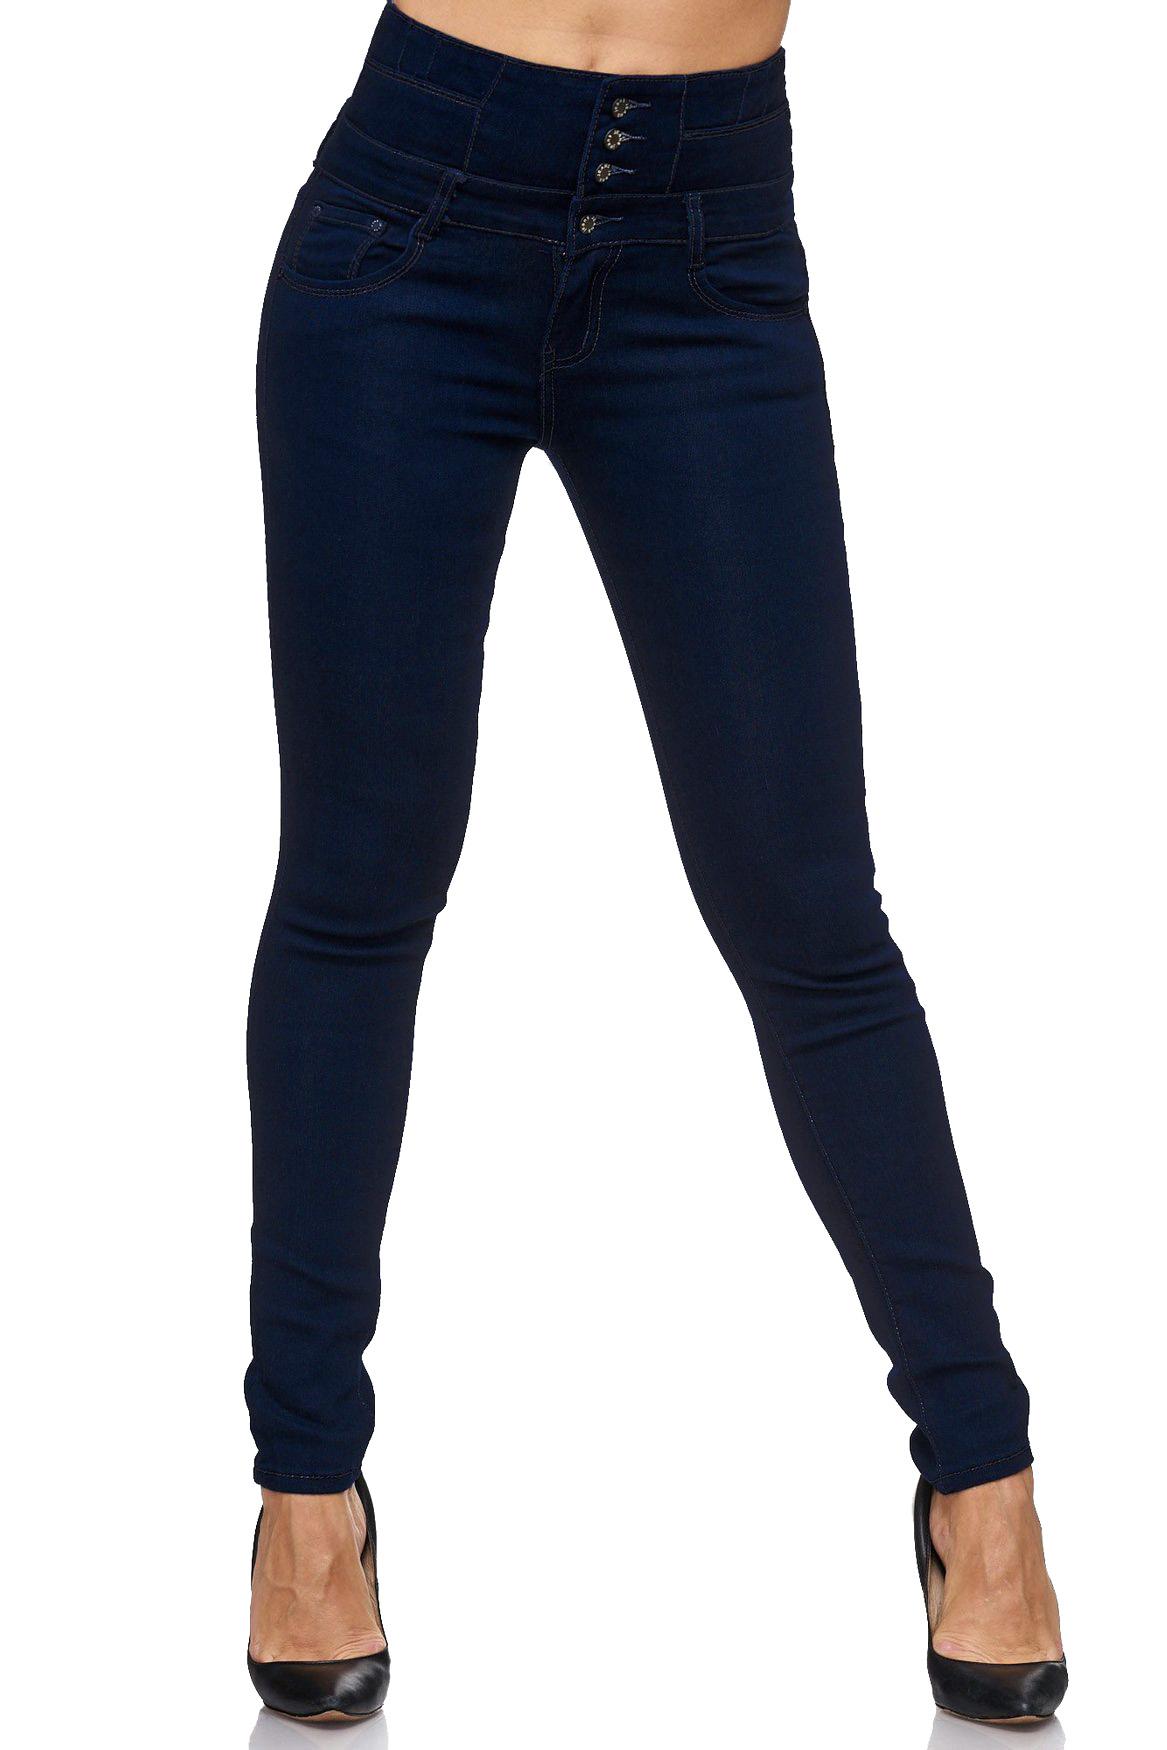 Nouveau Jeggins Jeans Femmes pantalon skinny jean skinny pantalon Jeggings hüftjeans